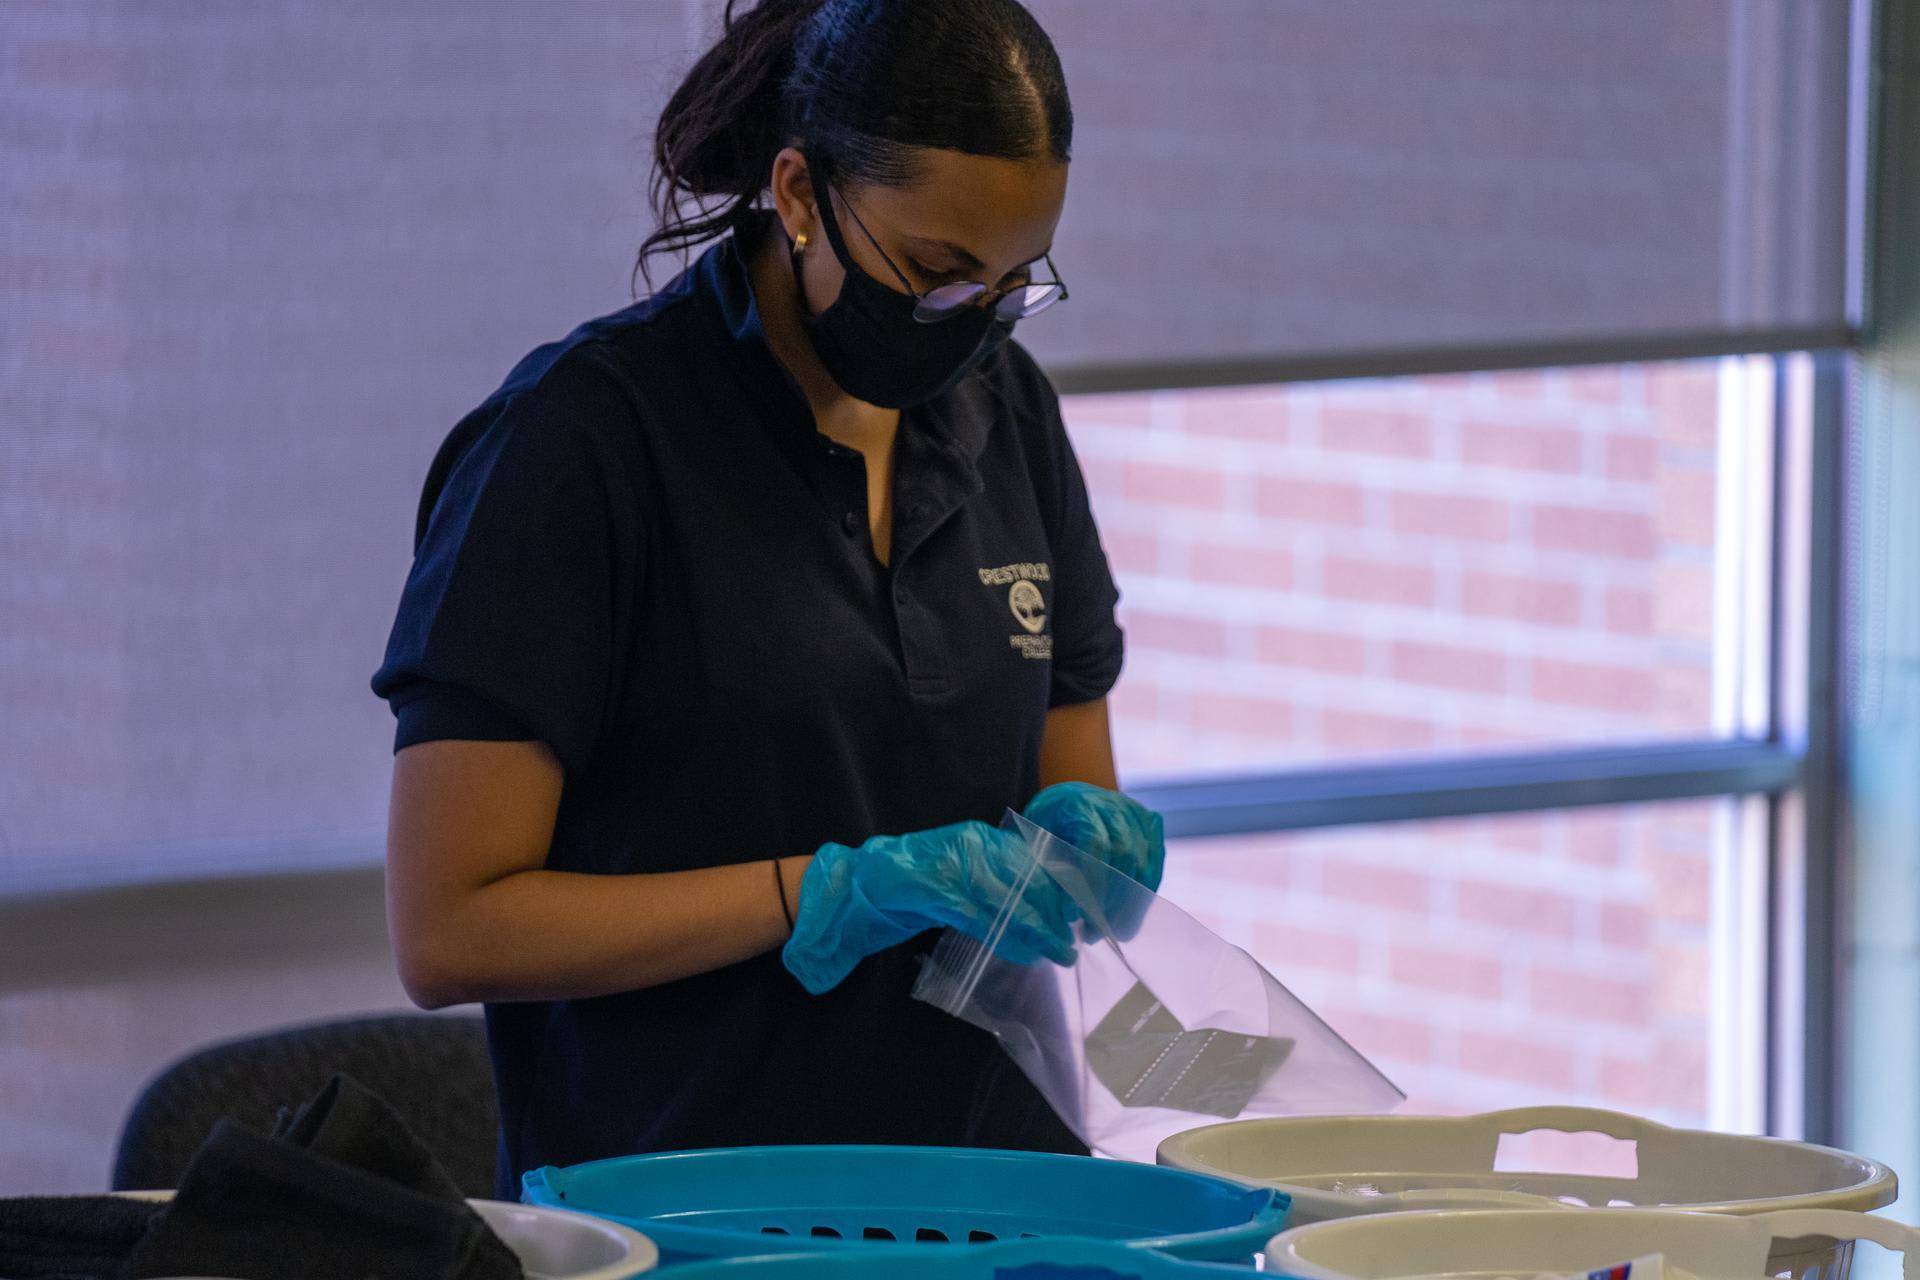 Crestwood Prep Students Sending Care During Pandemic